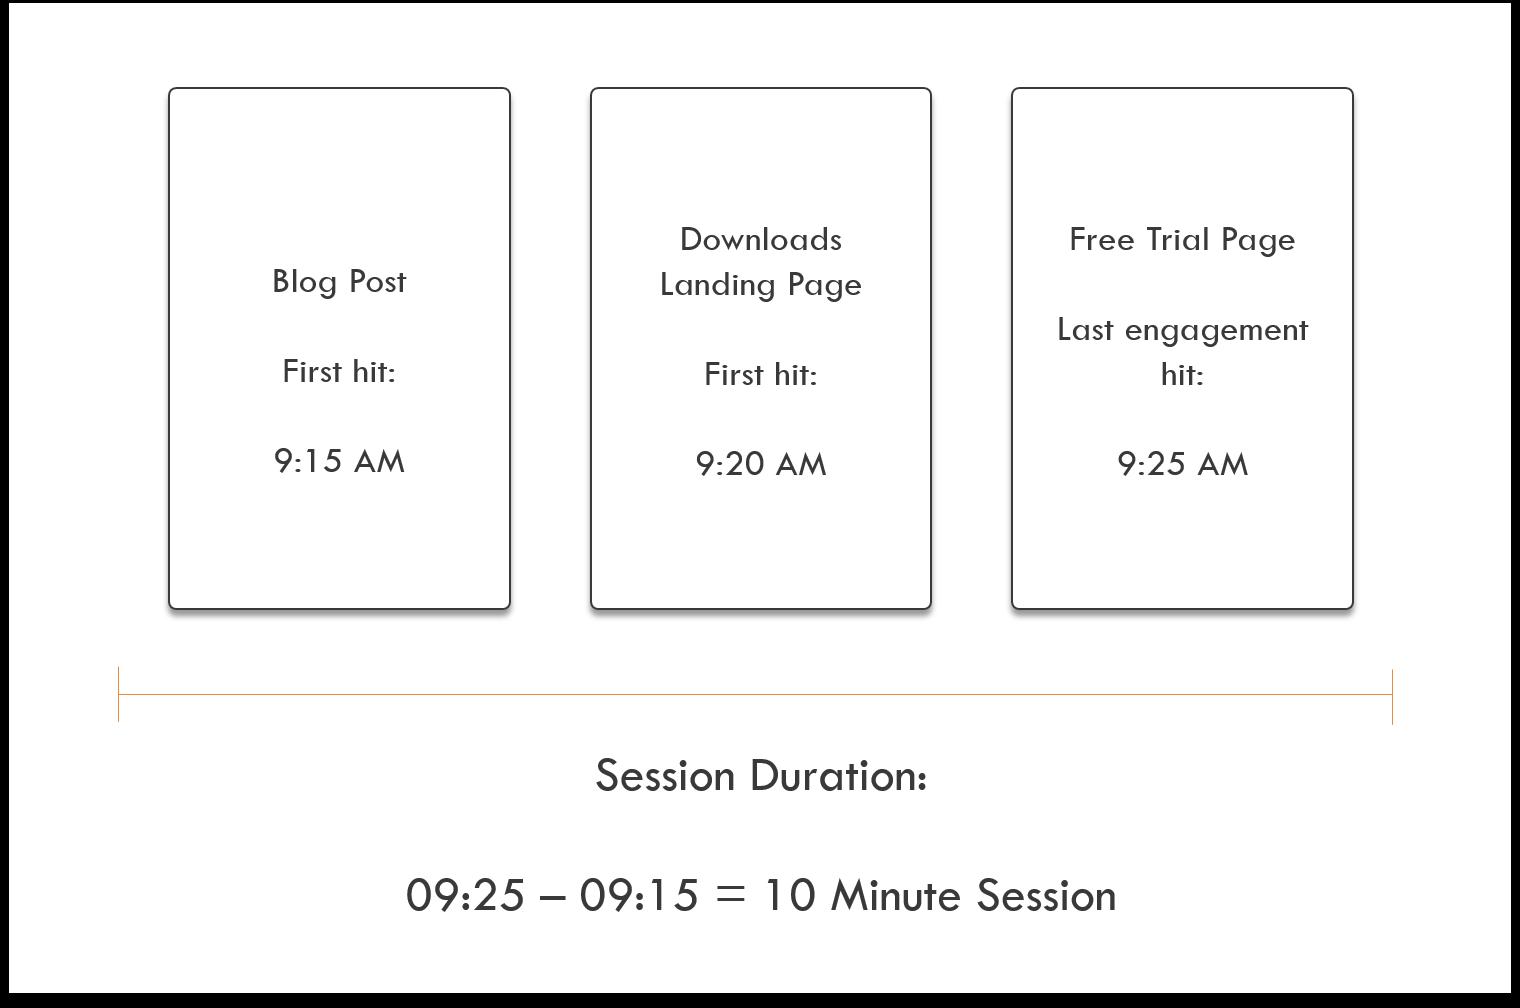 Content Engagement Metrics Average Session Duration Explanation